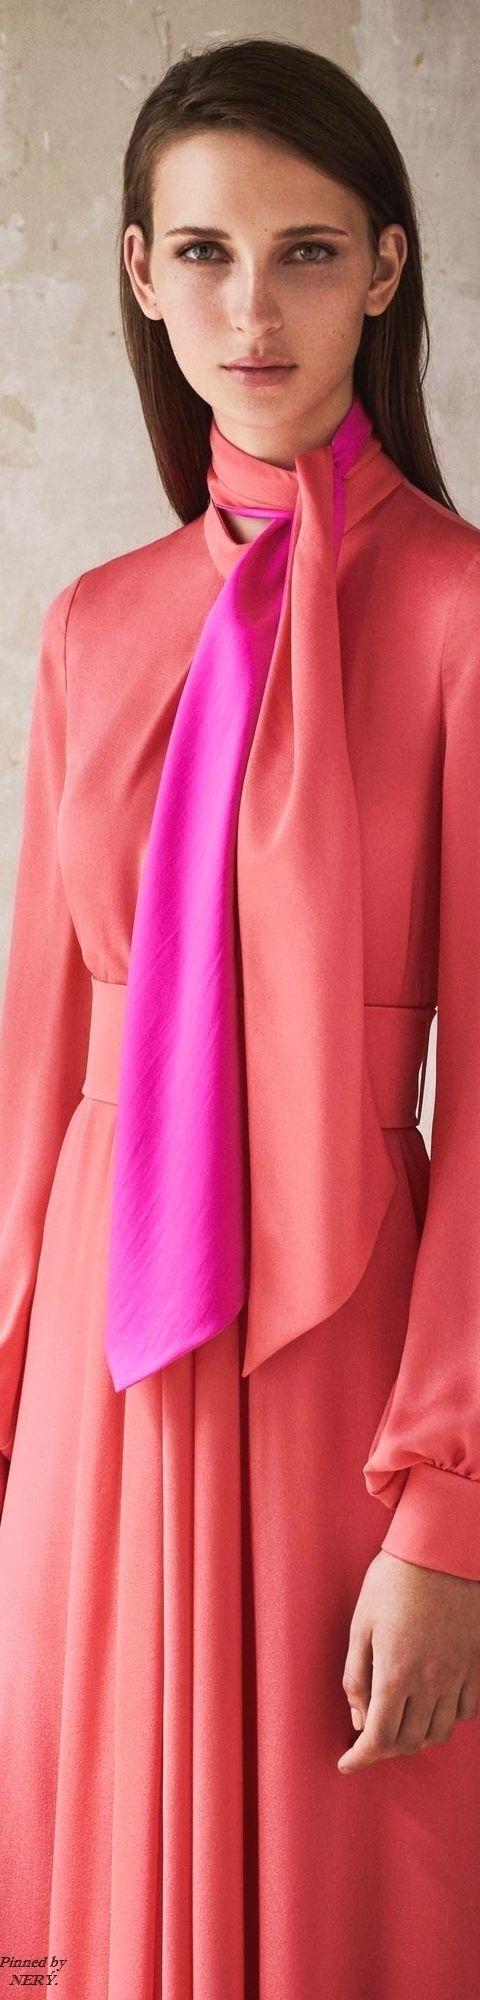 Fantástico Vestidos De Novia Carreteras Hampton Motivo - Ideas de ...